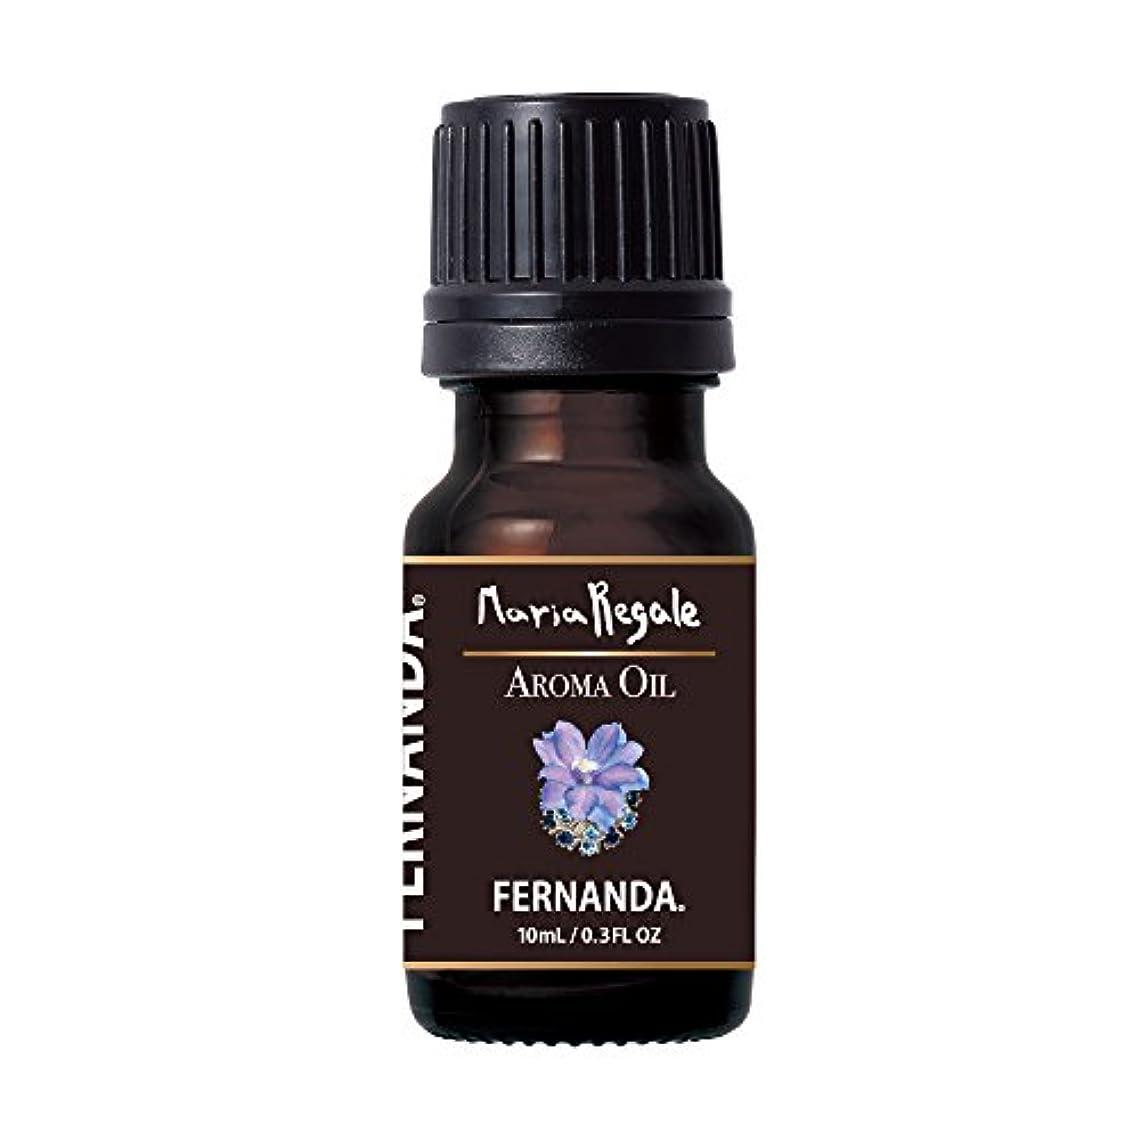 FERNANDA(フェルナンダ) Fragrance Aroma Oil Maria Regal (アロマオイル マリアリゲル)